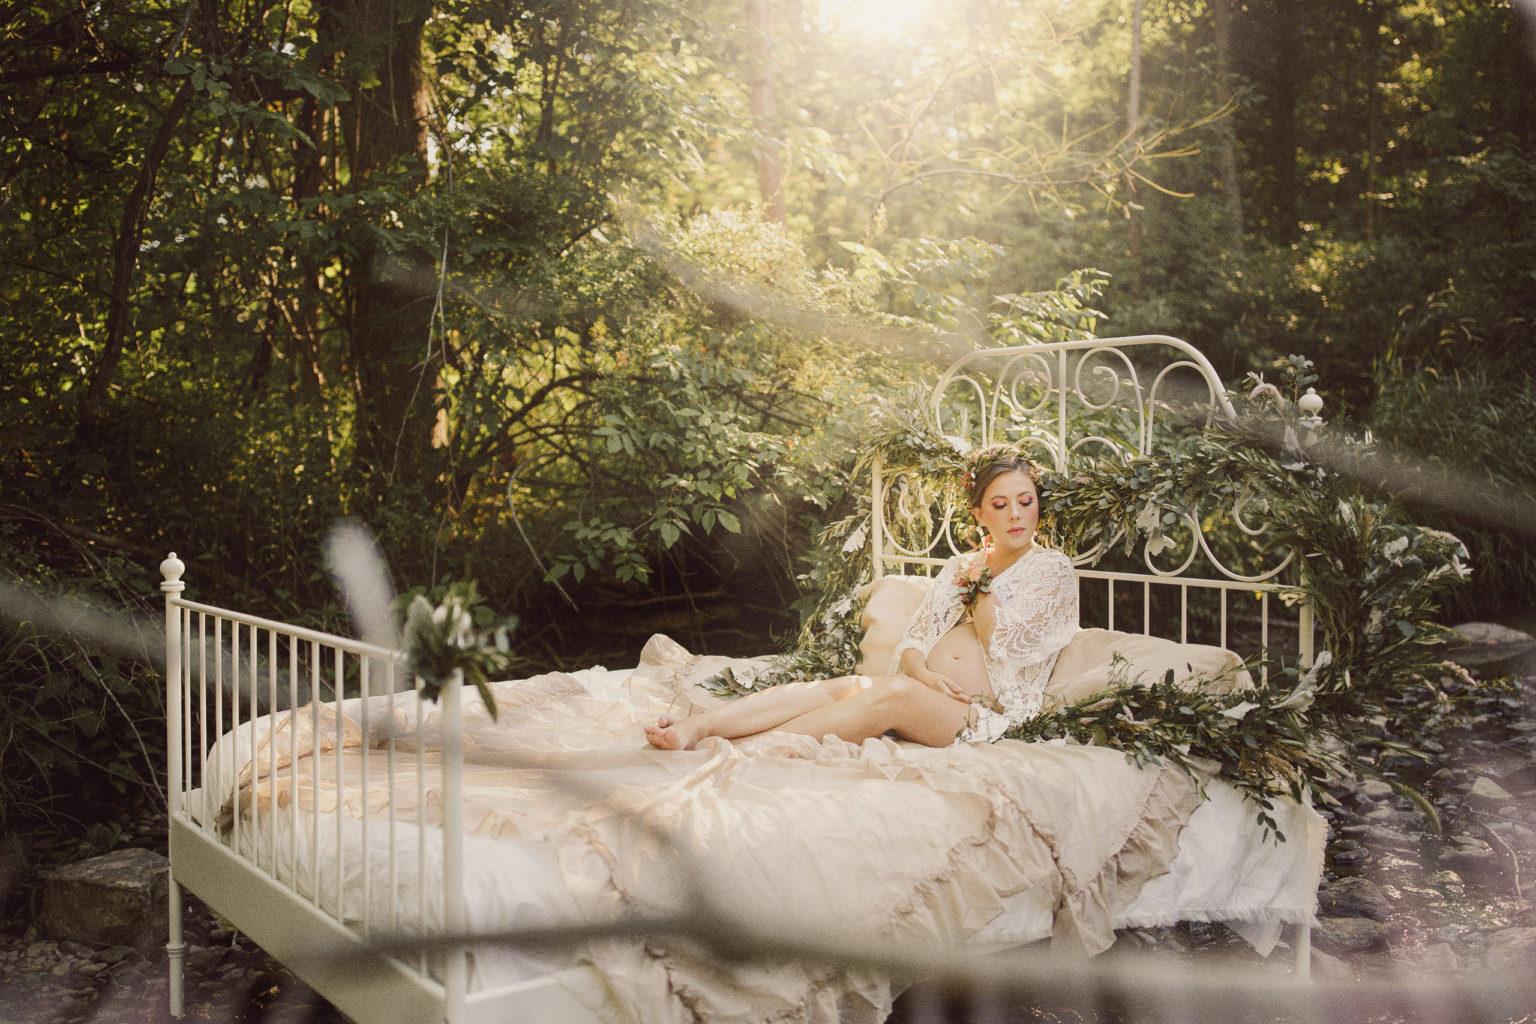 niagara maternity boudoir photography